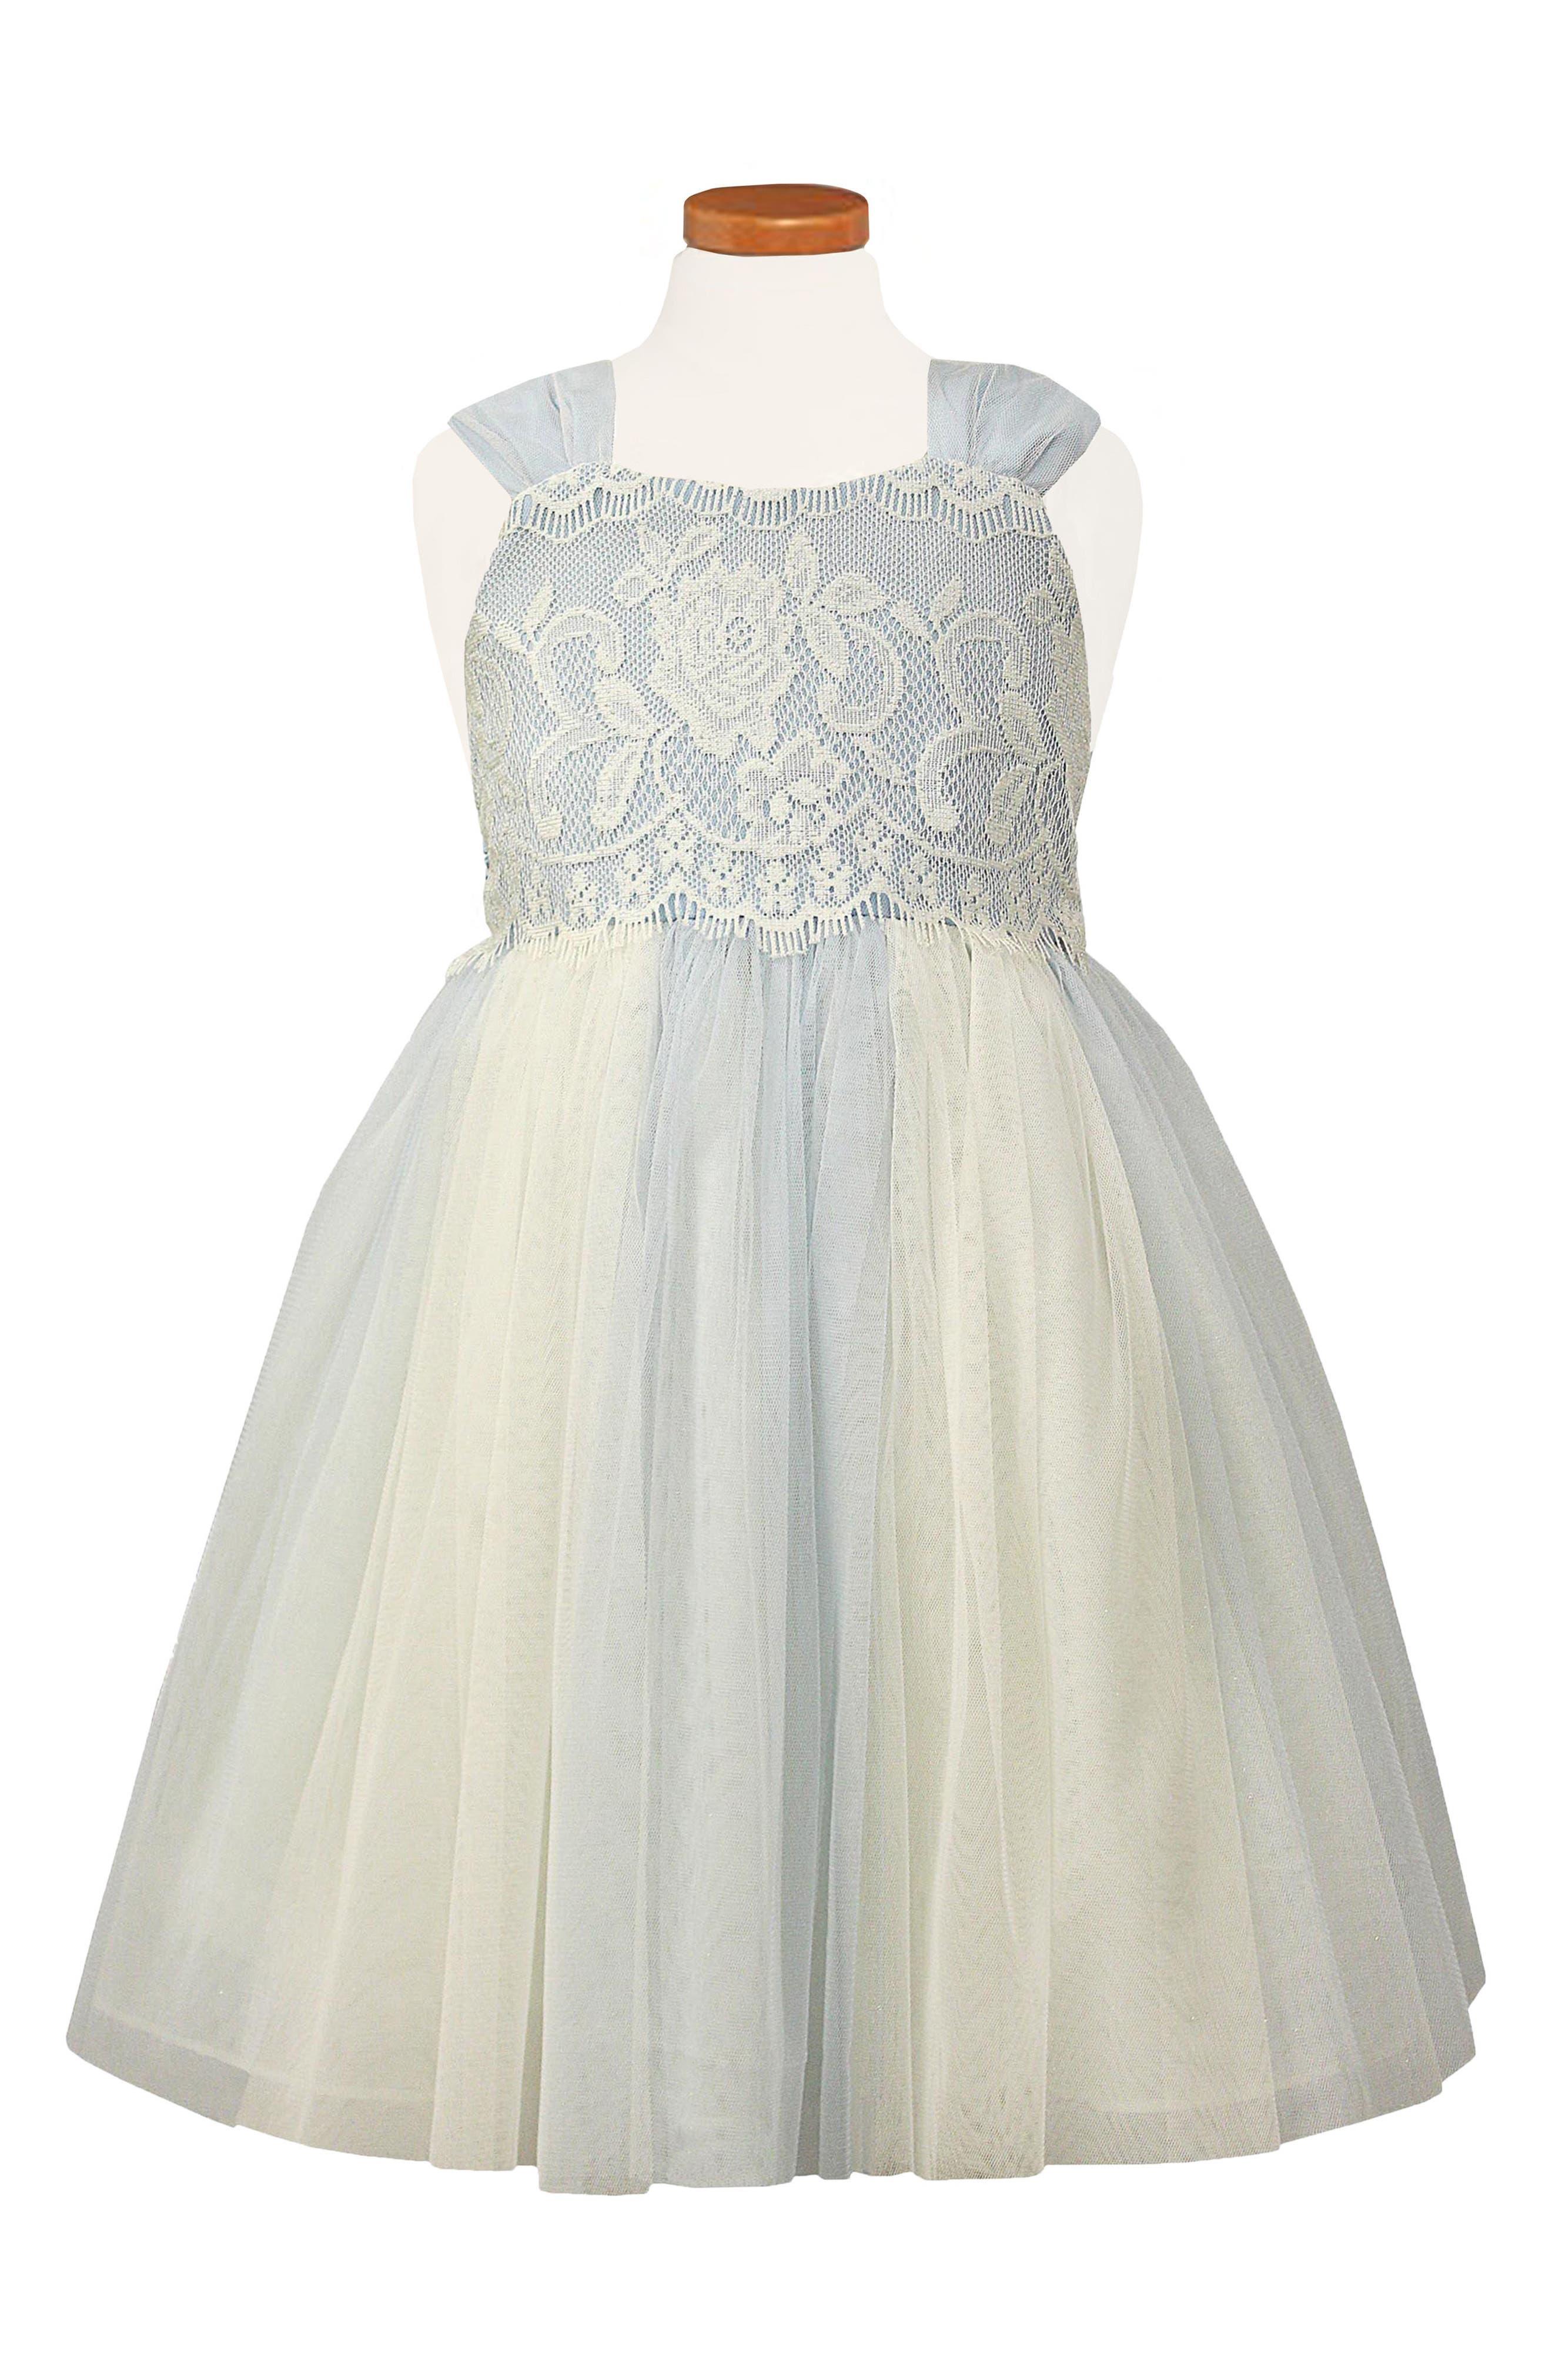 Sorbet Lace & Tulle Fit & Flare Dress (Toddler Girls & Little Girls)